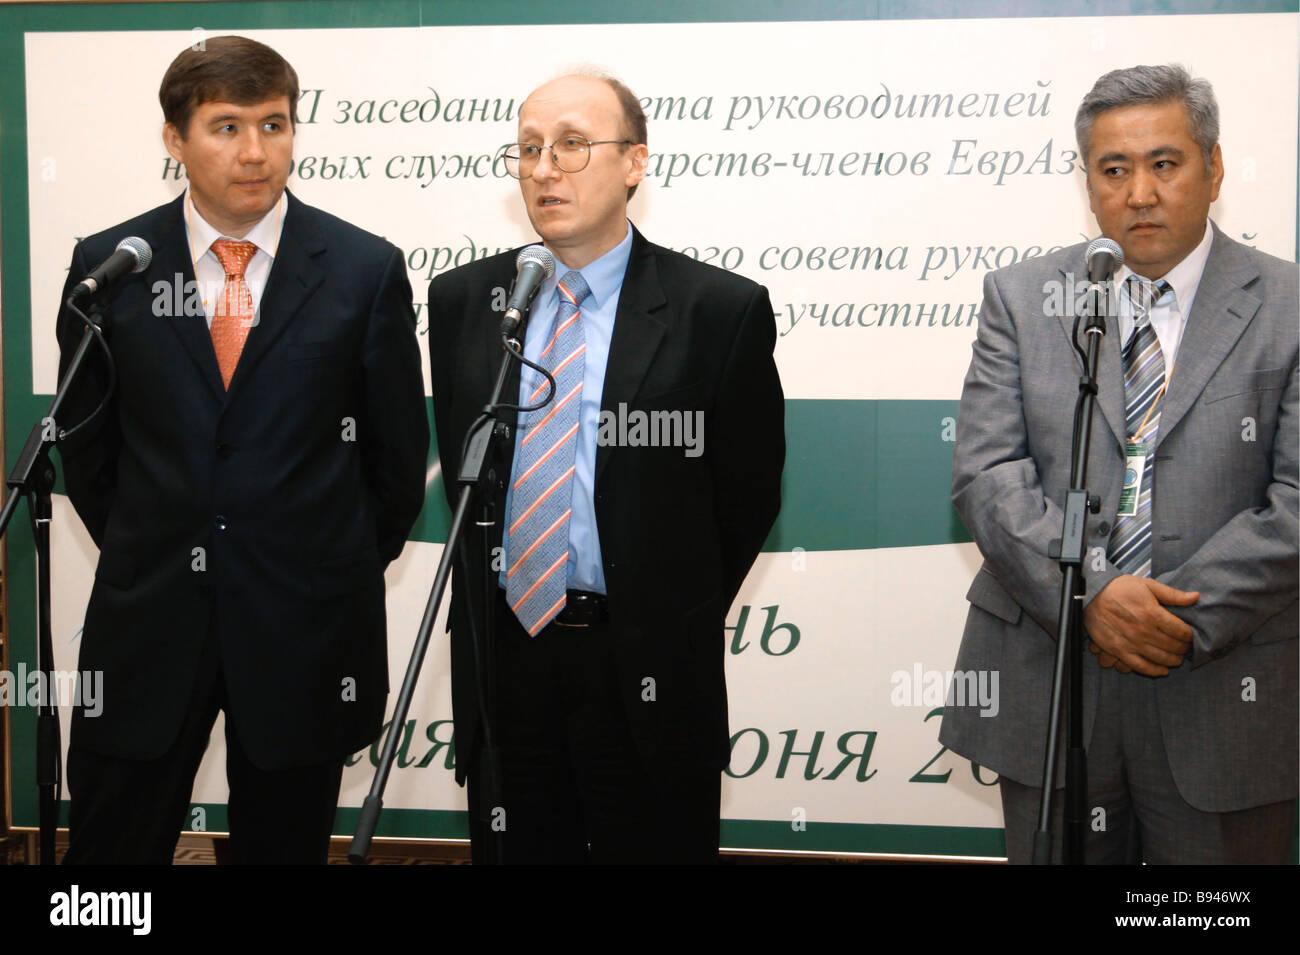 Head of the Russian Federal Taxation Service Mikhail Mokretsov center - Stock Image